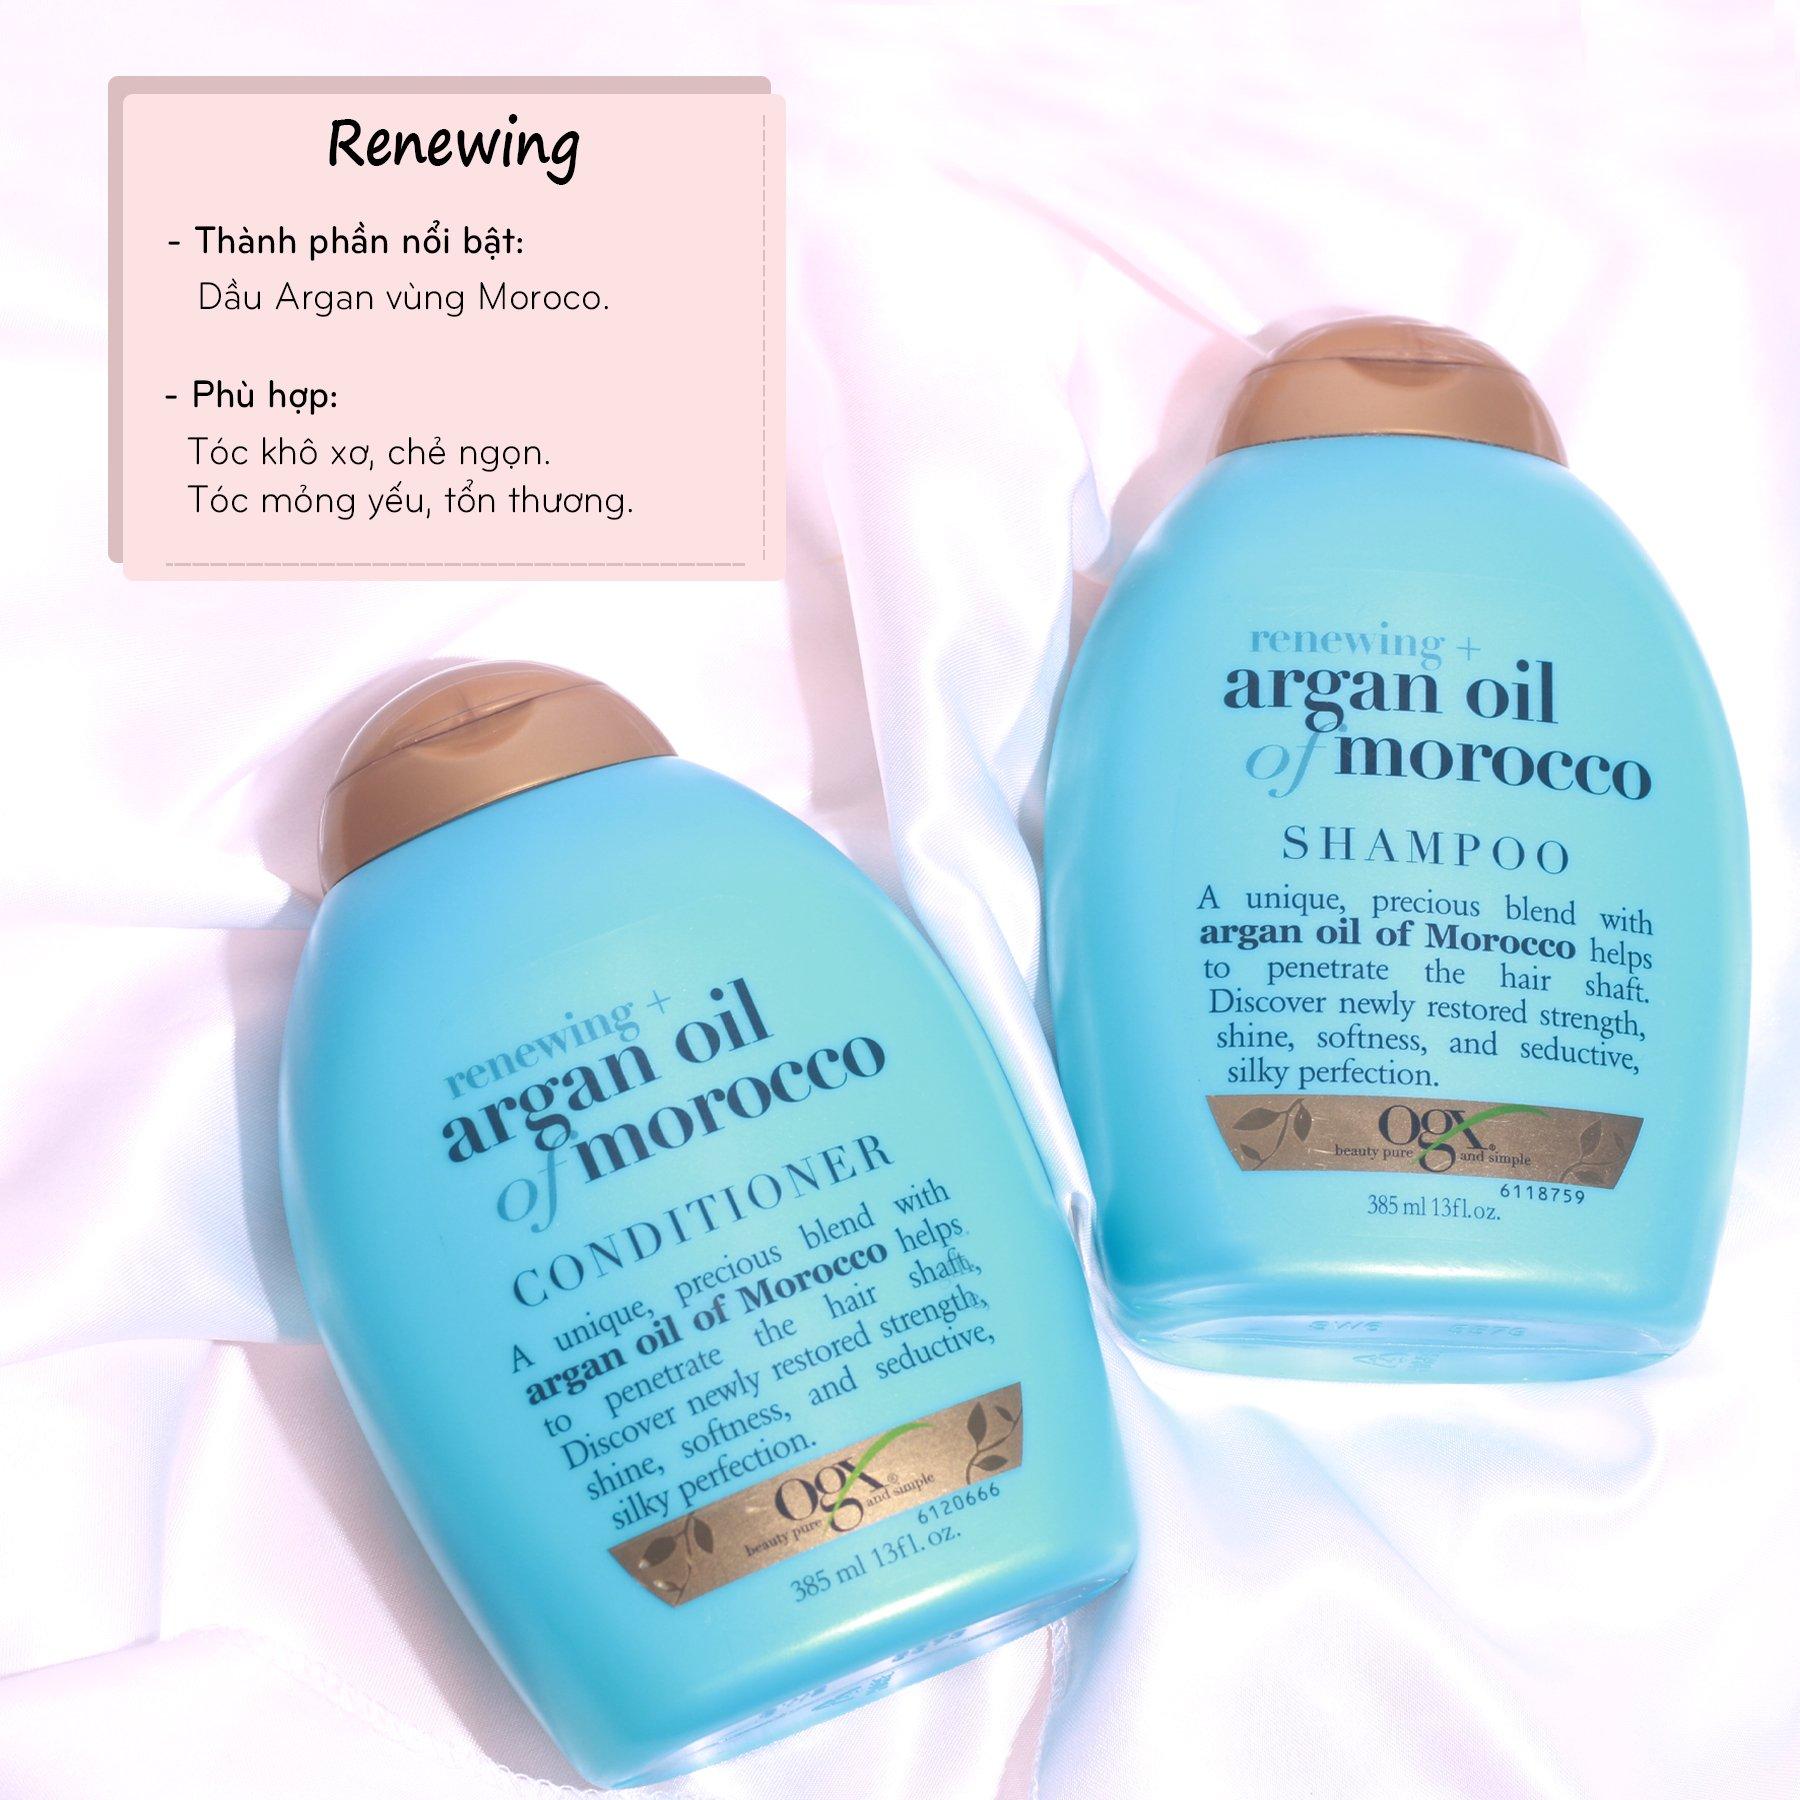 Dầu Gội OGX Renewing + Argan Oil Of Morocco Shampoo 385ml